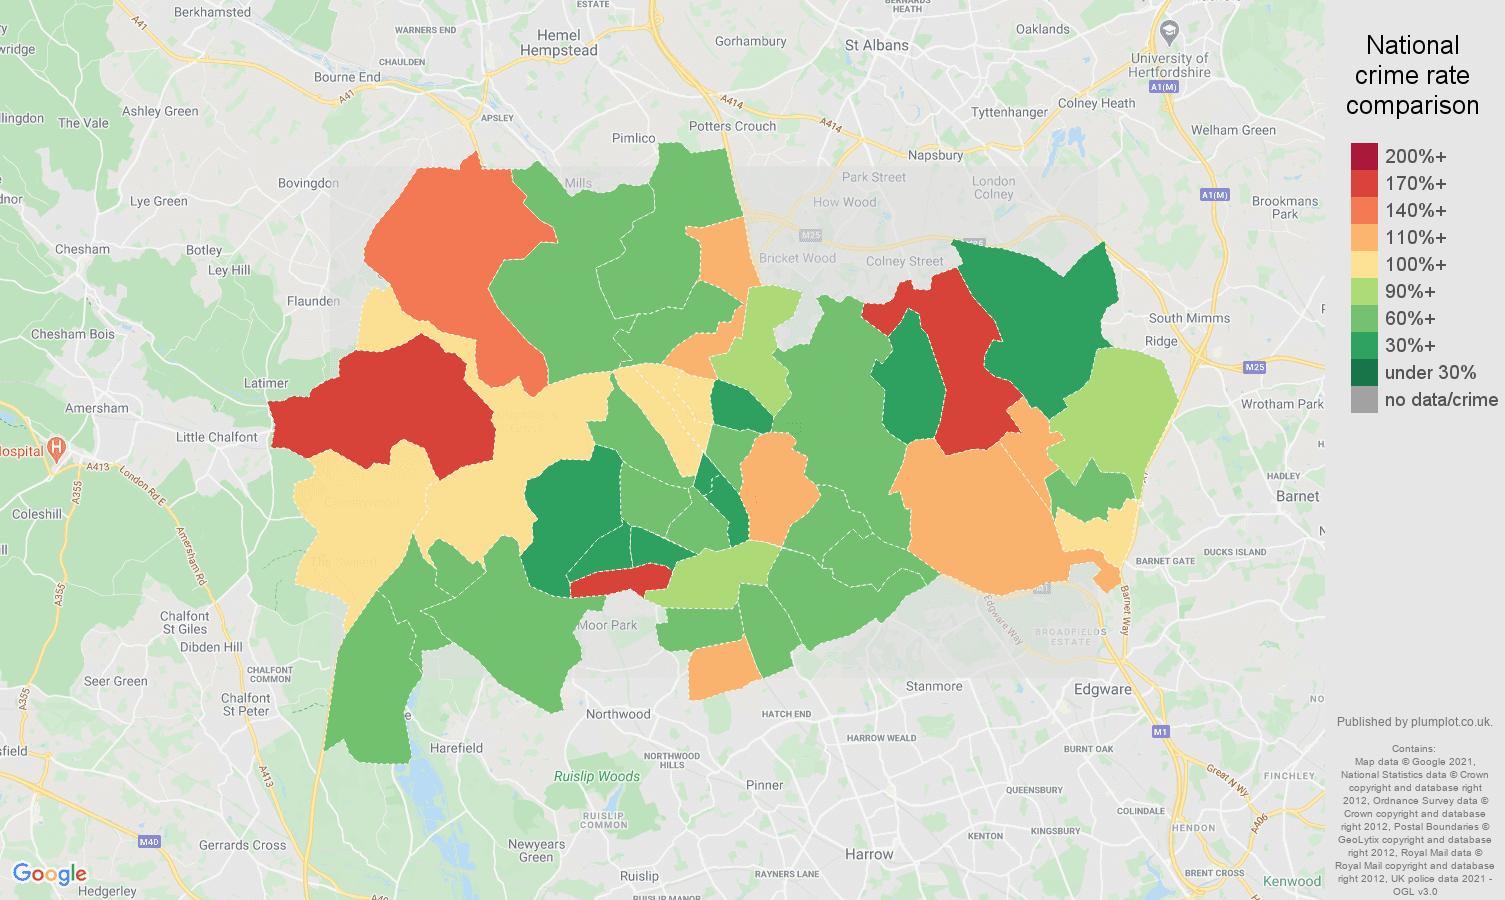 Watford burglary crime rate comparison map